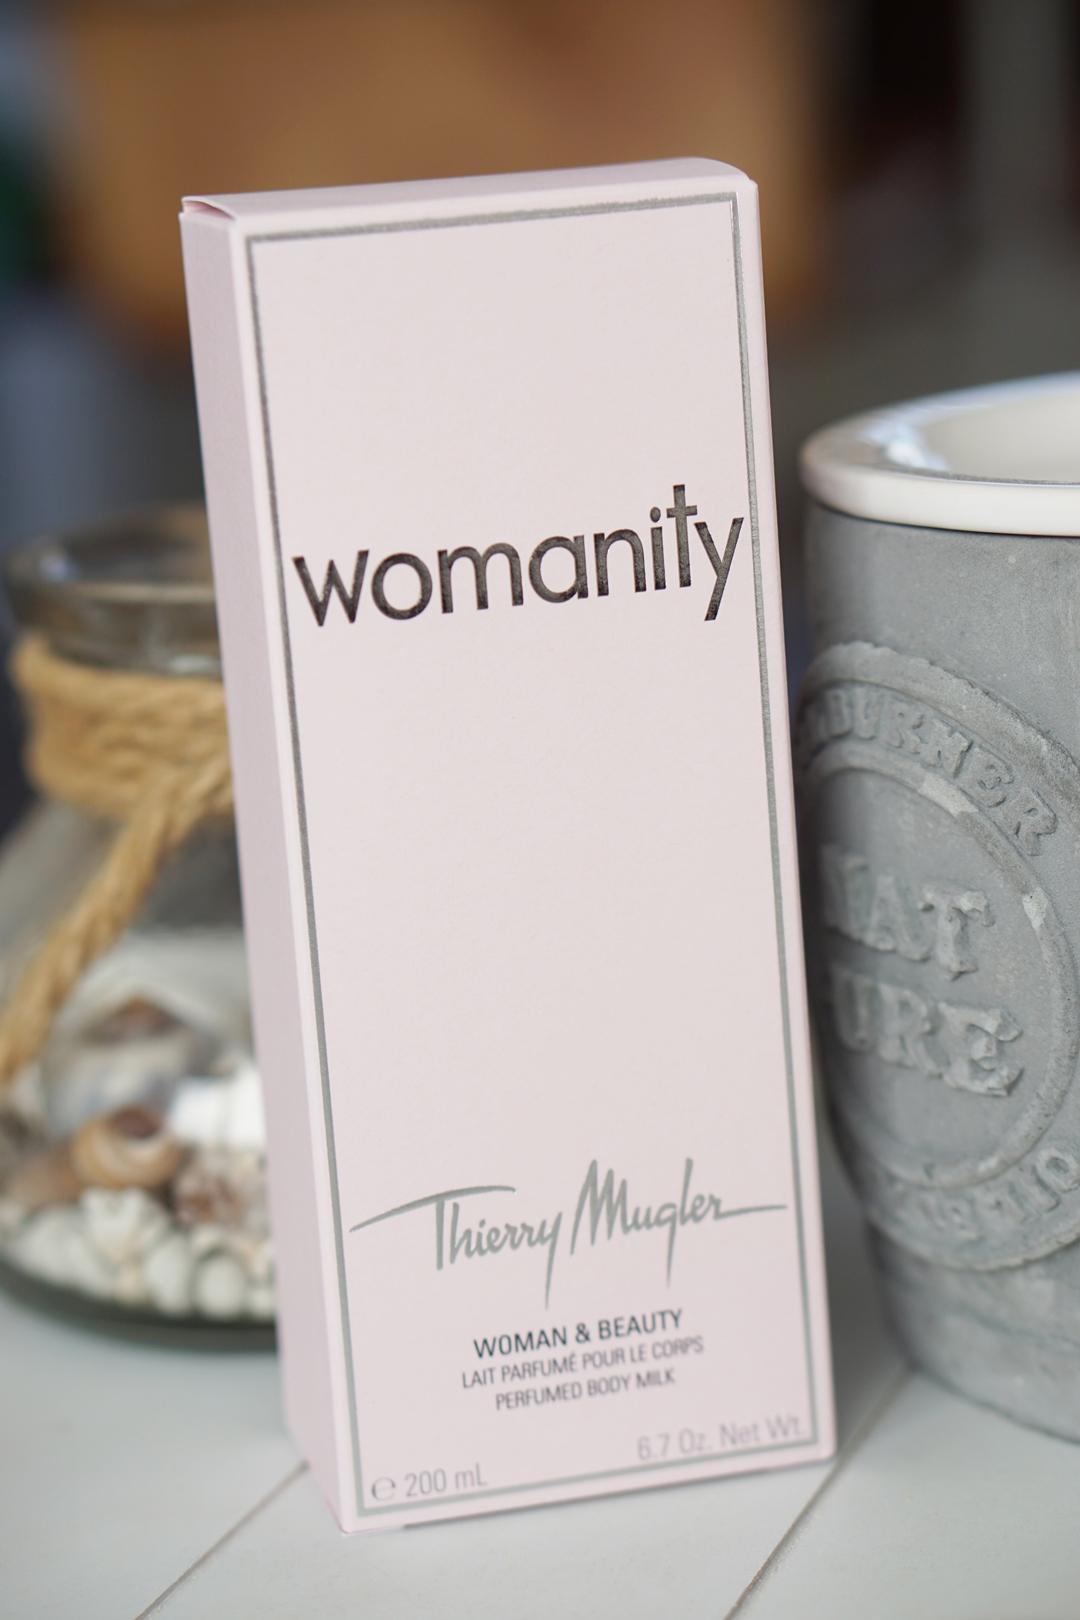 Thierry Mugler Womanity Bodylotion